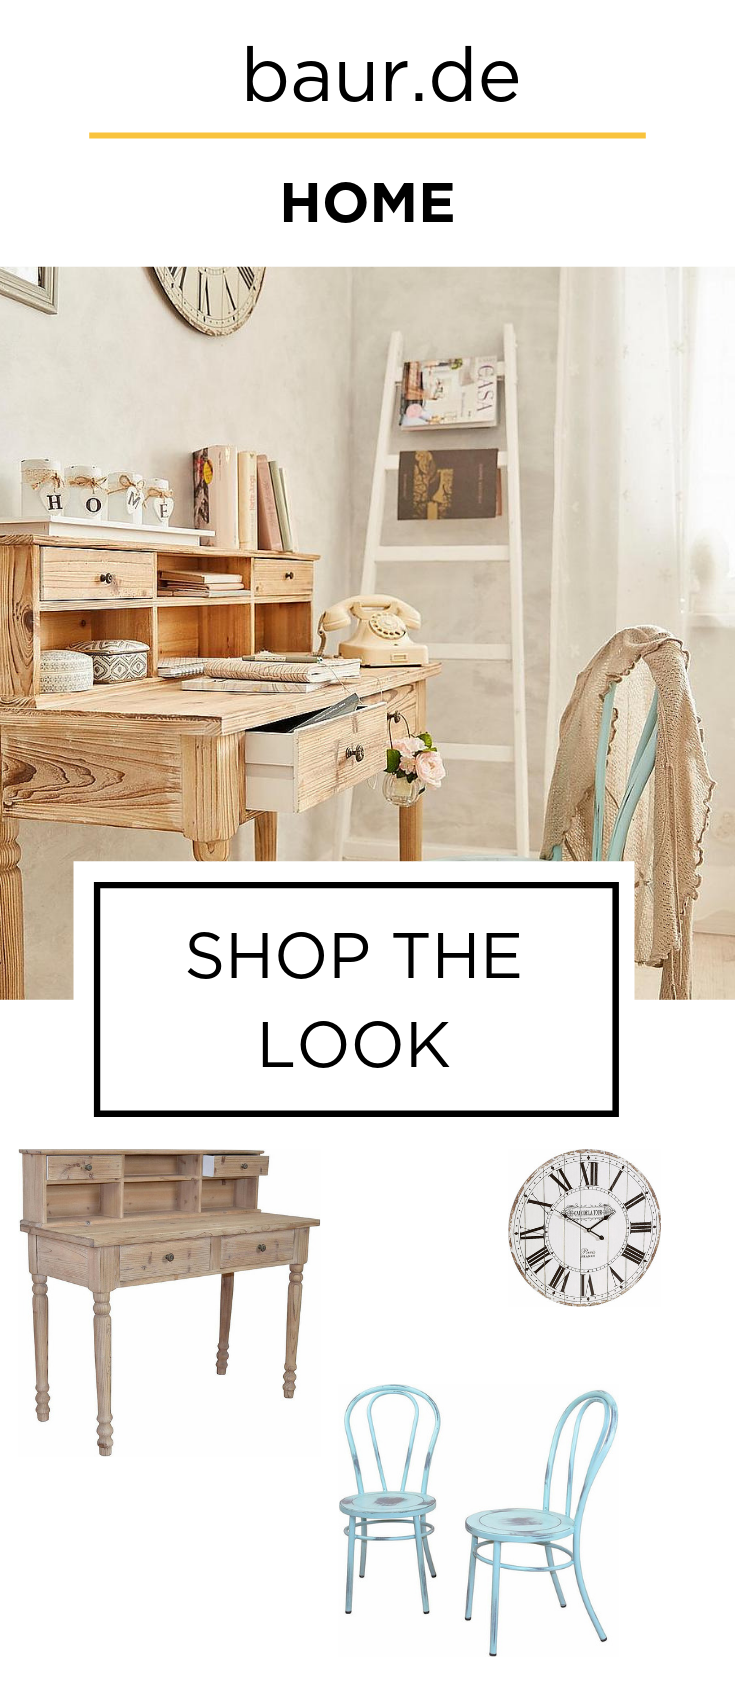 Entdecke Auf Baur De Shop The Look Einrichtungsideen Zum